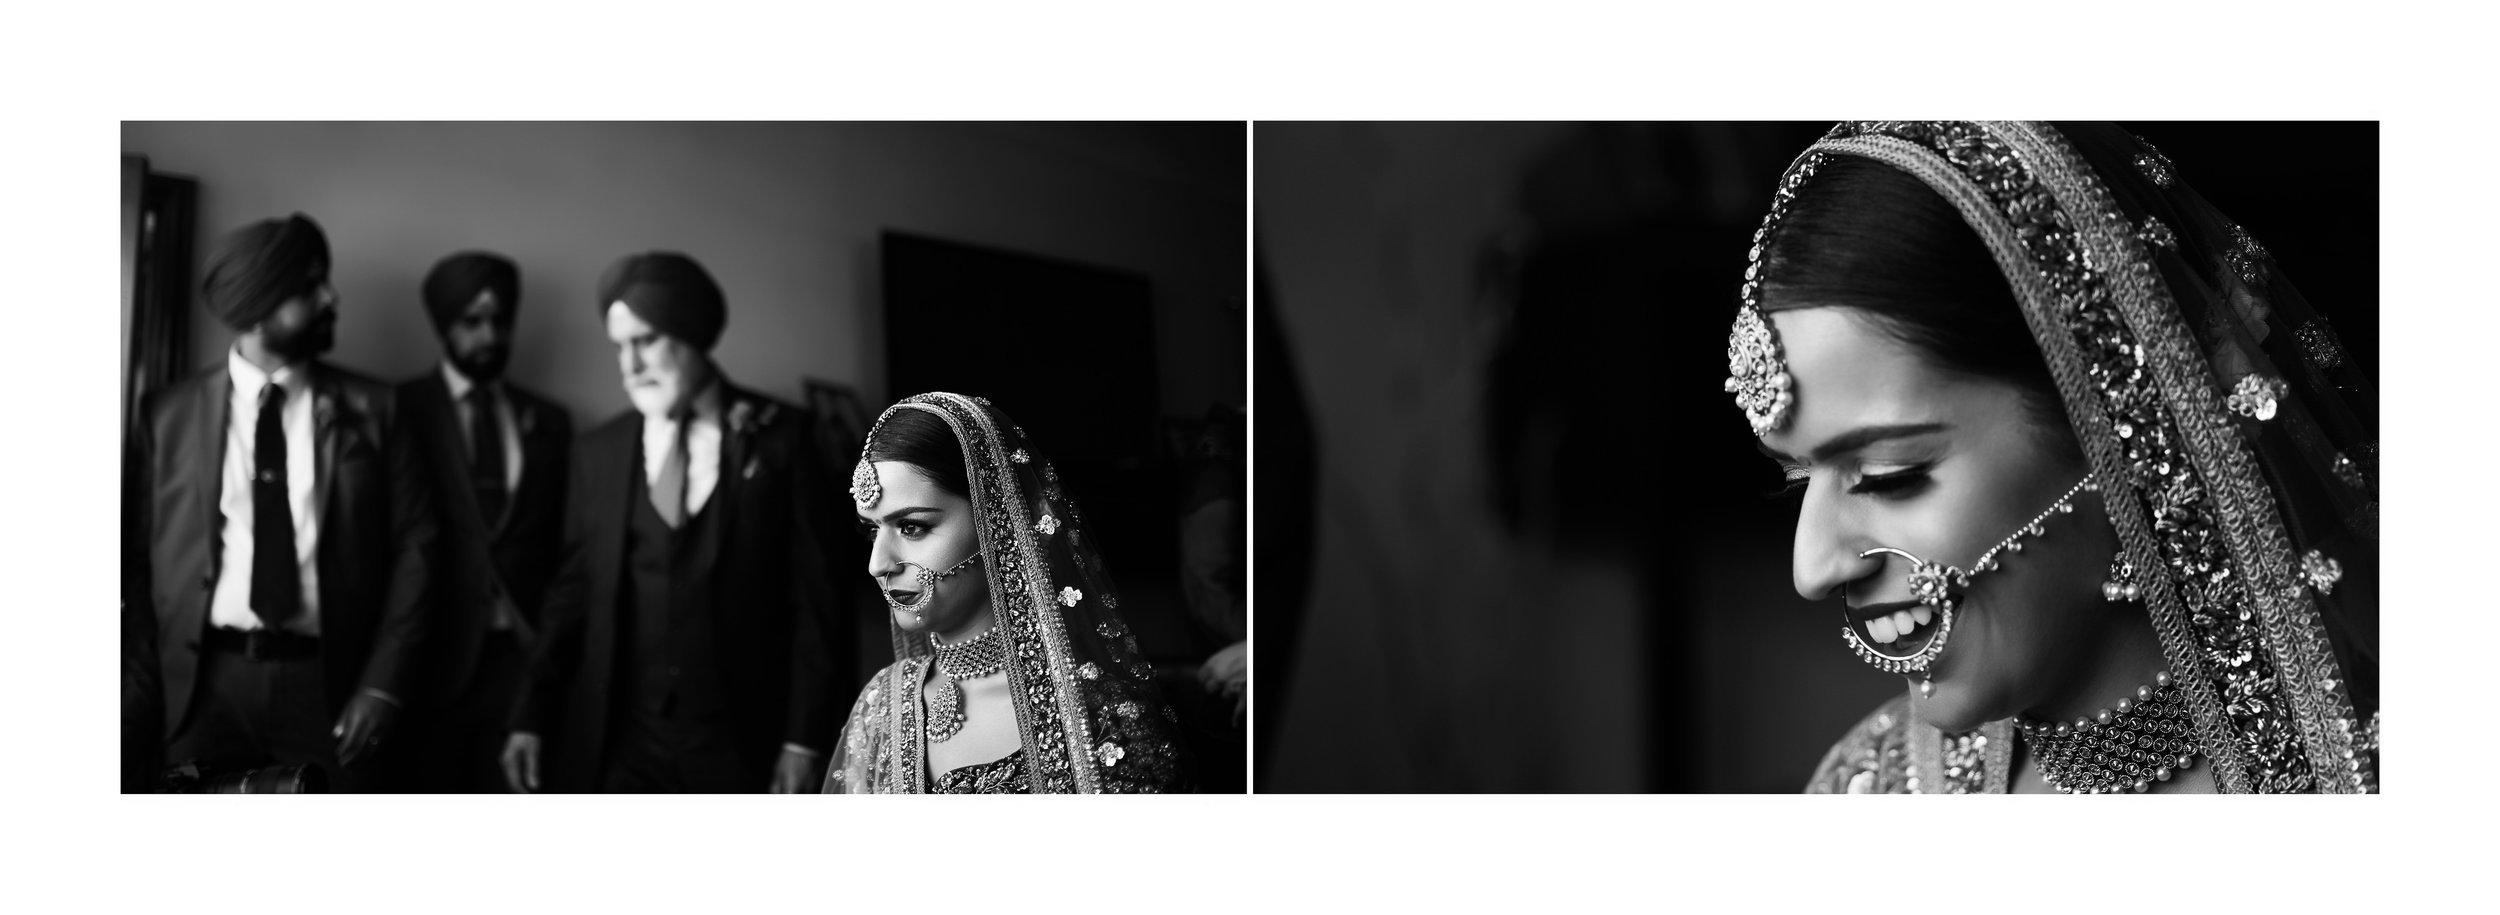 Sikh Wedding - Jaspreet and Indy-10.jpg